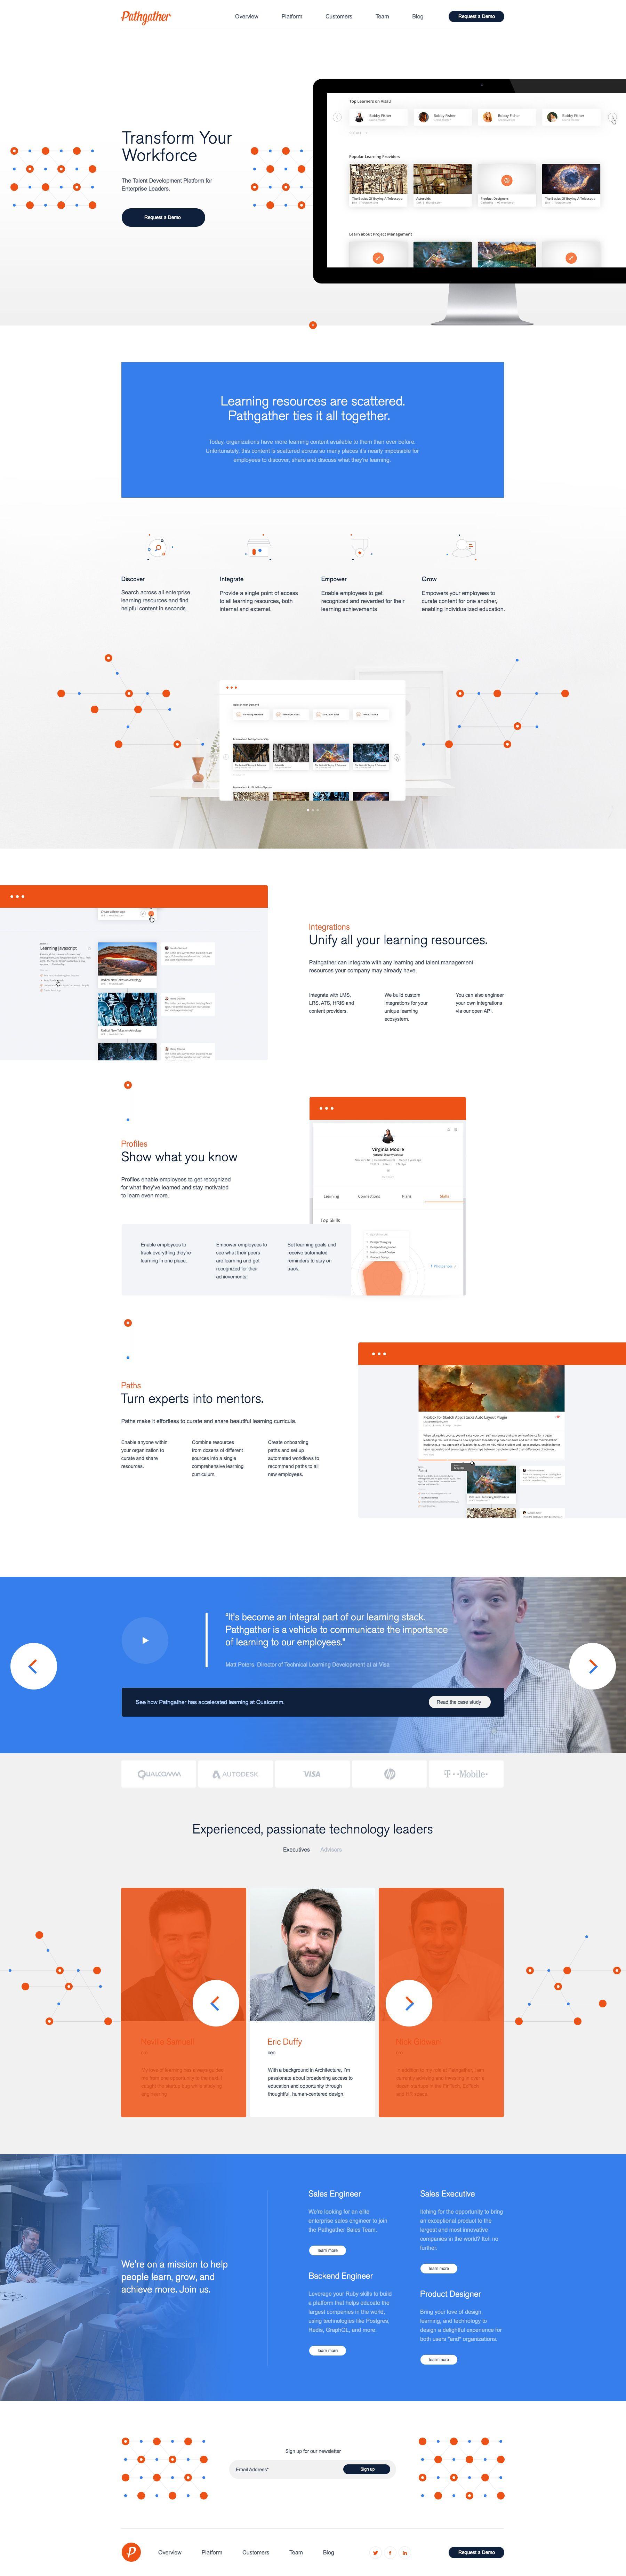 Pixels Web Design User Experience Web Design Web Design Inspiration